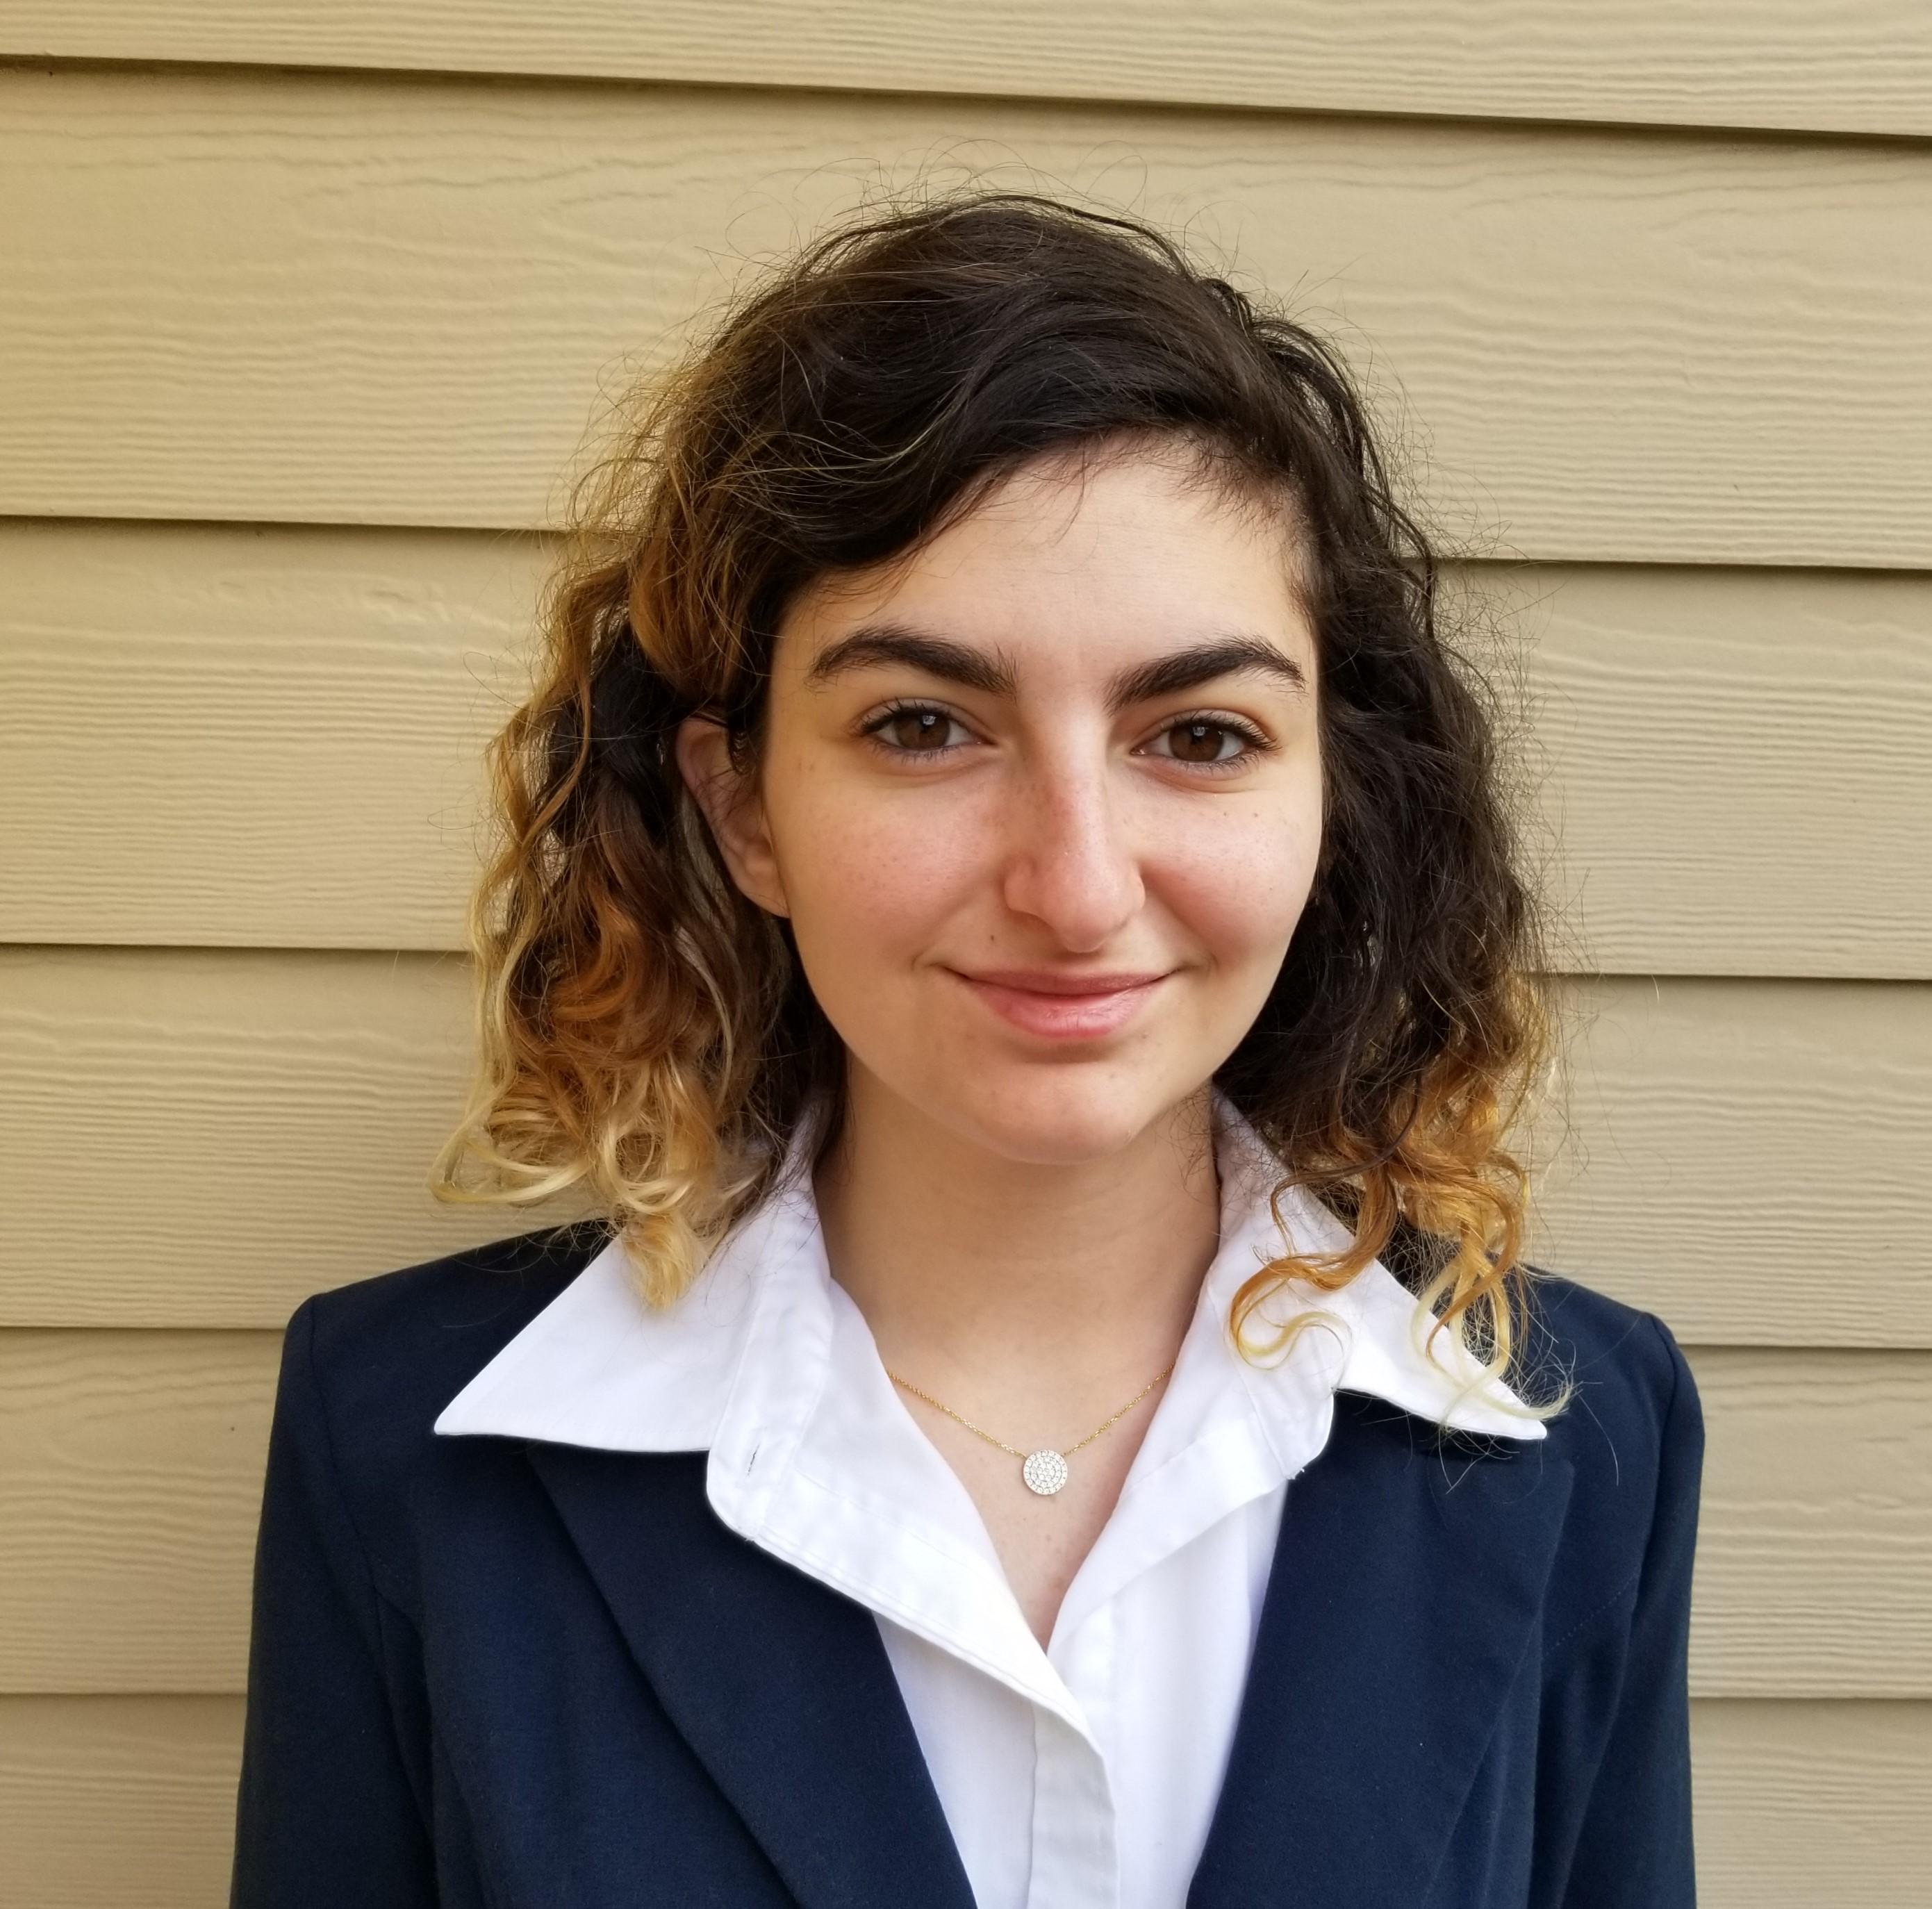 Tala Sidawi